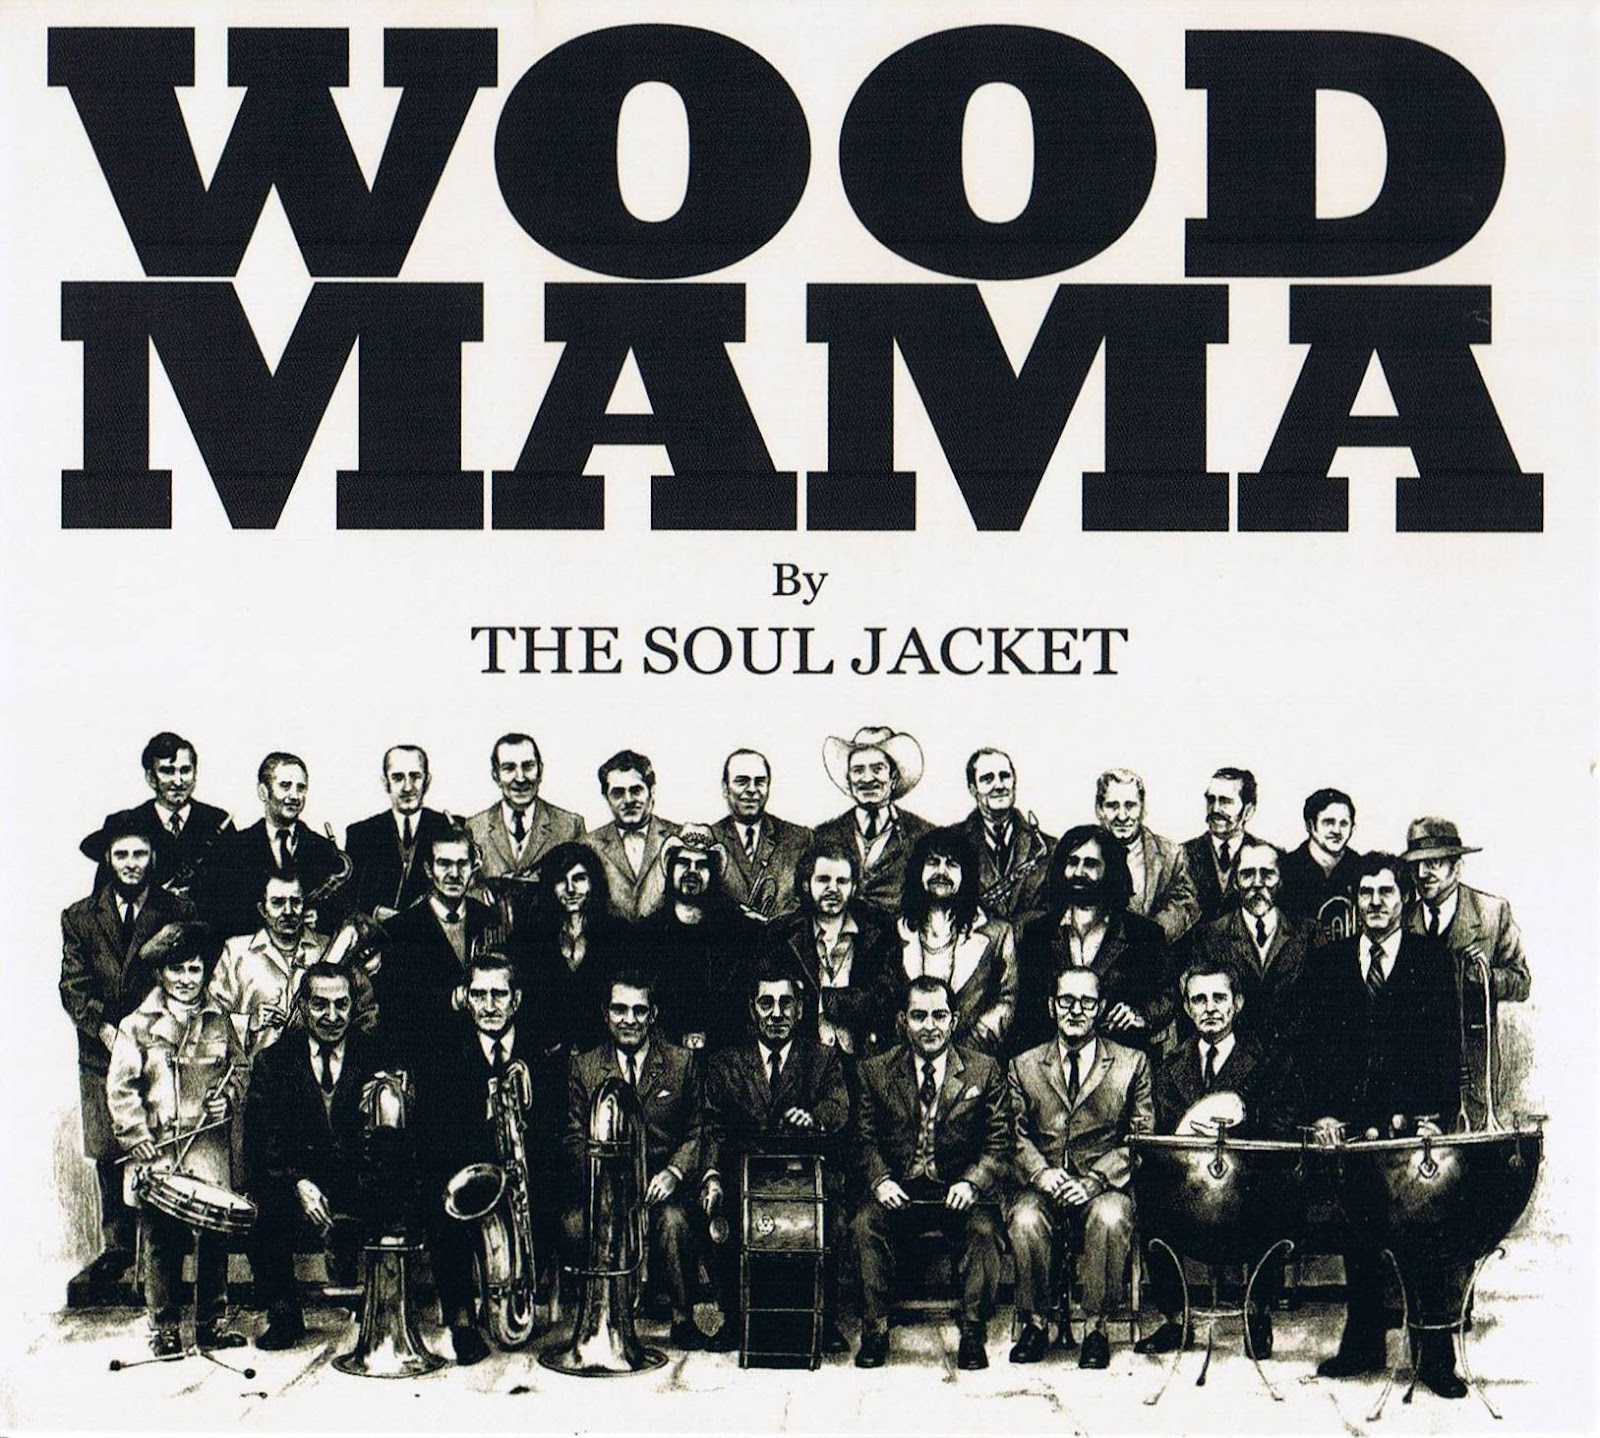 The Soul Jacket Wood Mama